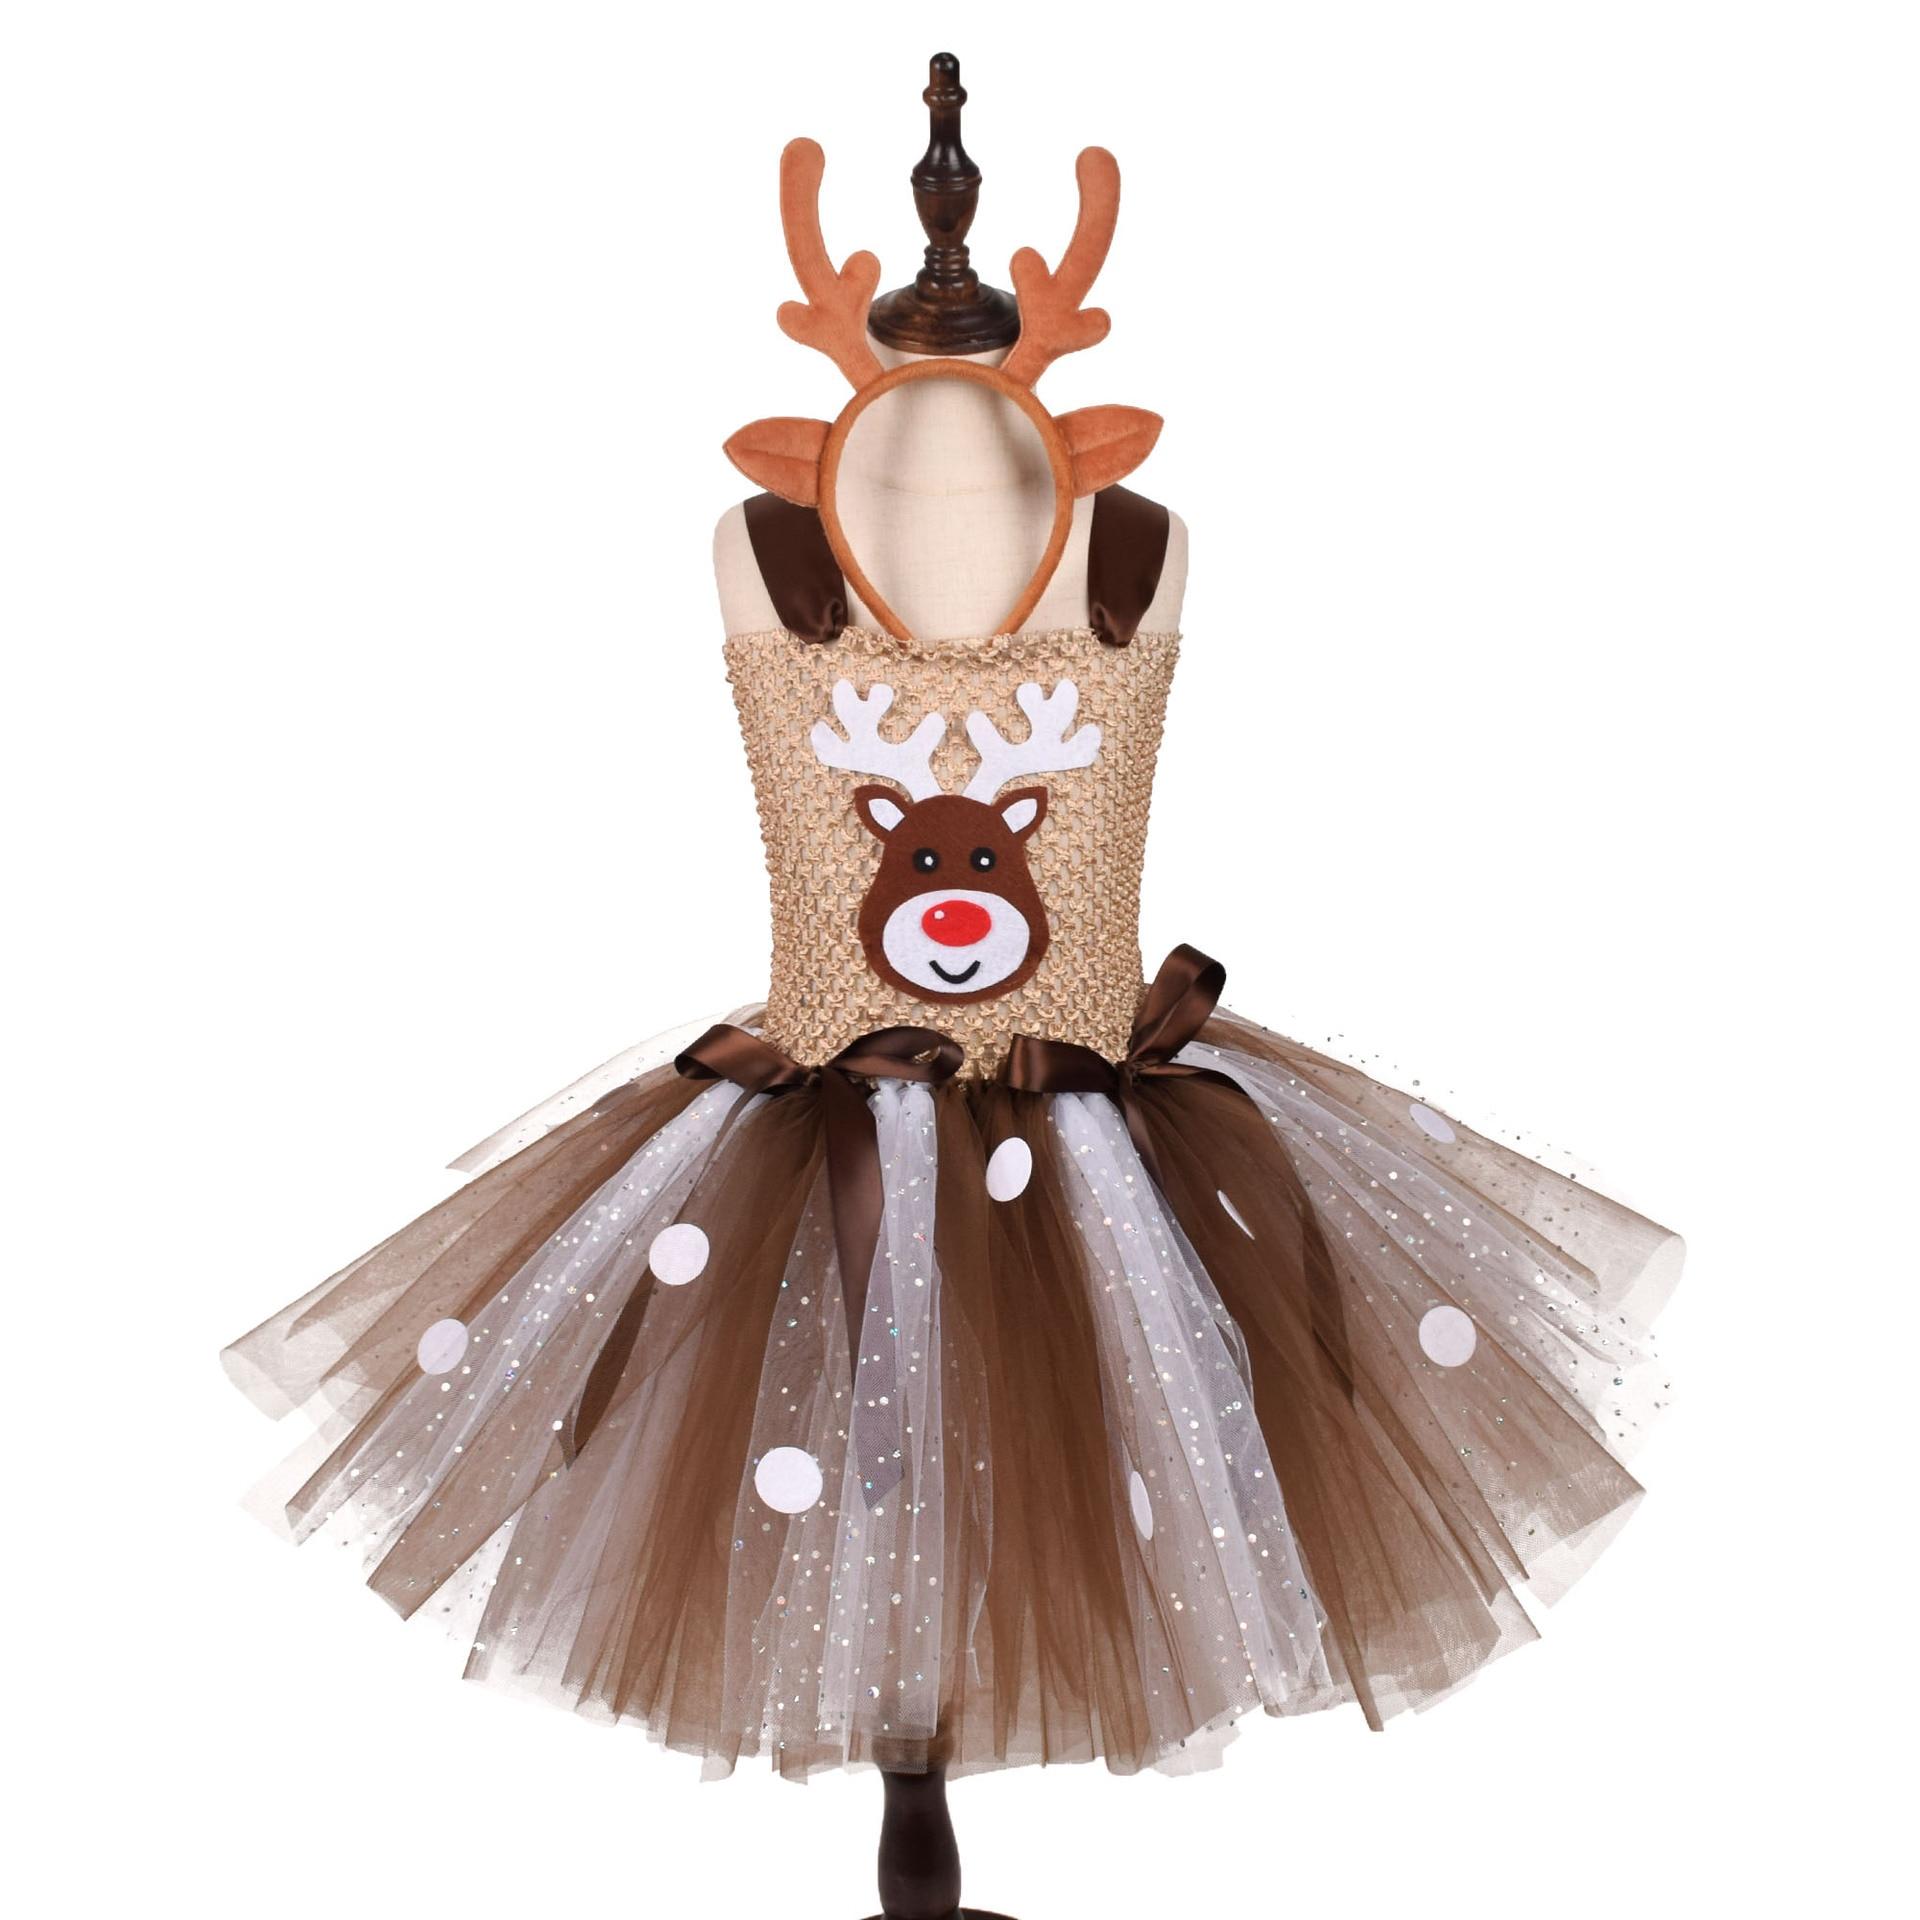 Christmas Cute Deer Tutu Dress for Girls with Hairband Halloween Cosplay Costume Kids Reindeer Princess Dresses cute unicorn mermaid reindeer costume cosplay girls tutu princess dress halloween costume for kids